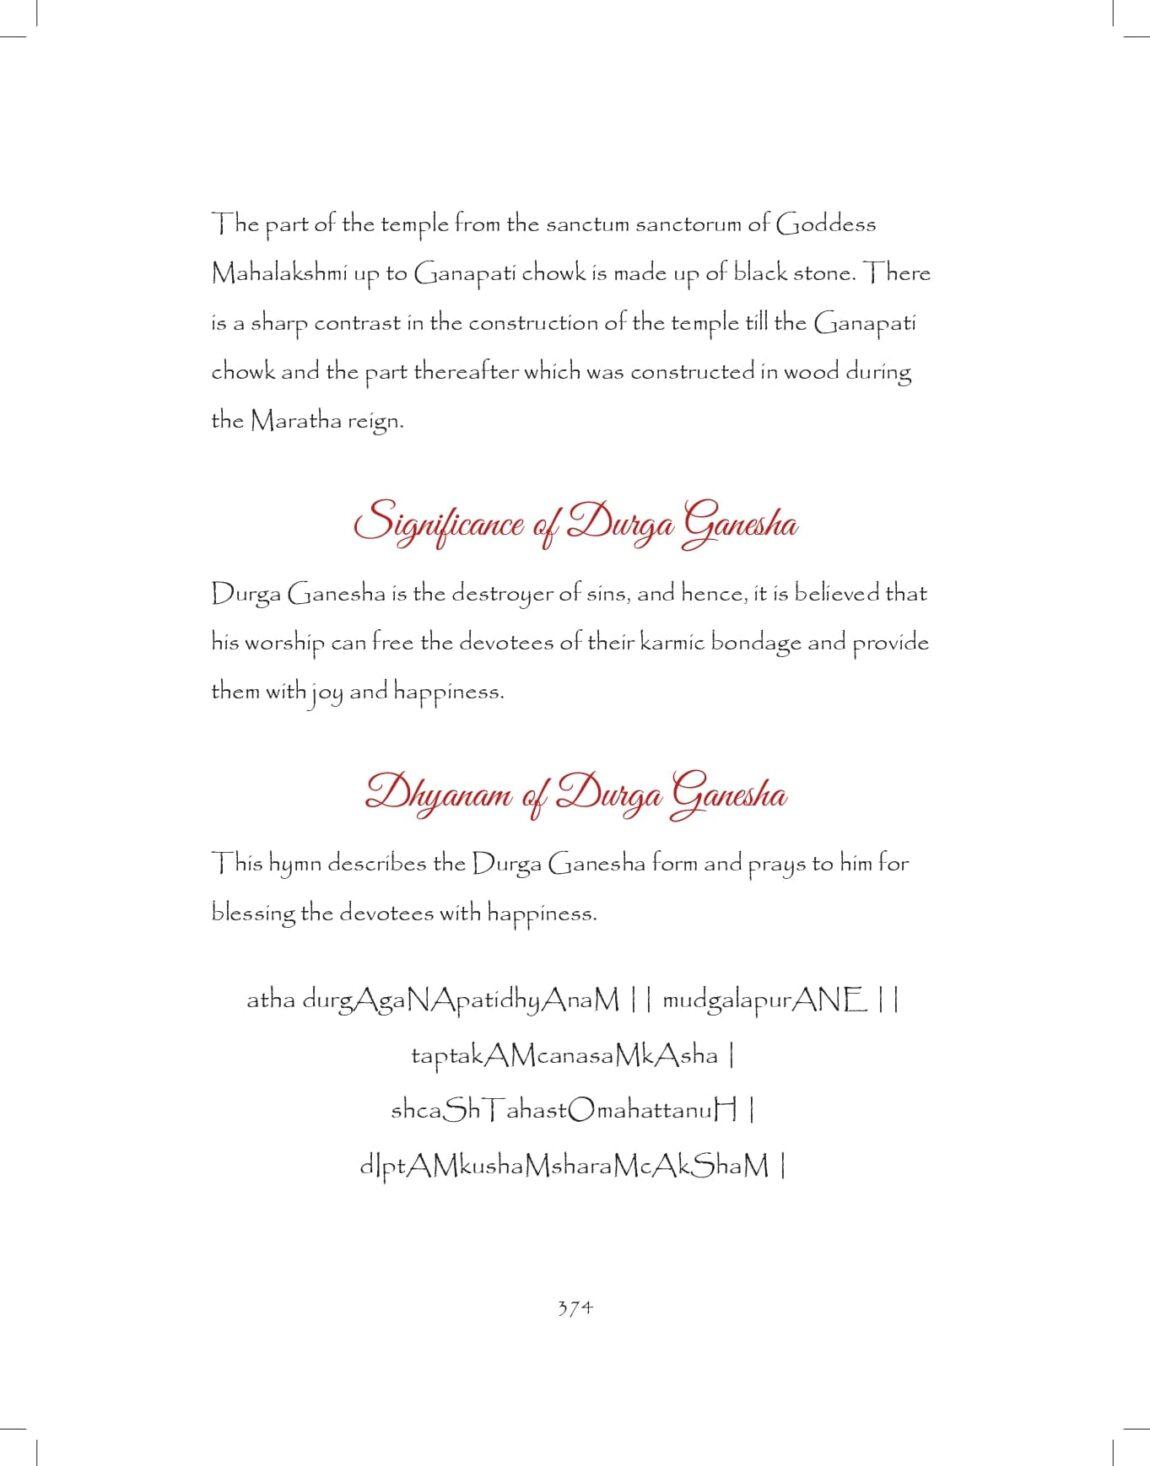 Ganesh-print_pages-to-jpg-0374.jpg